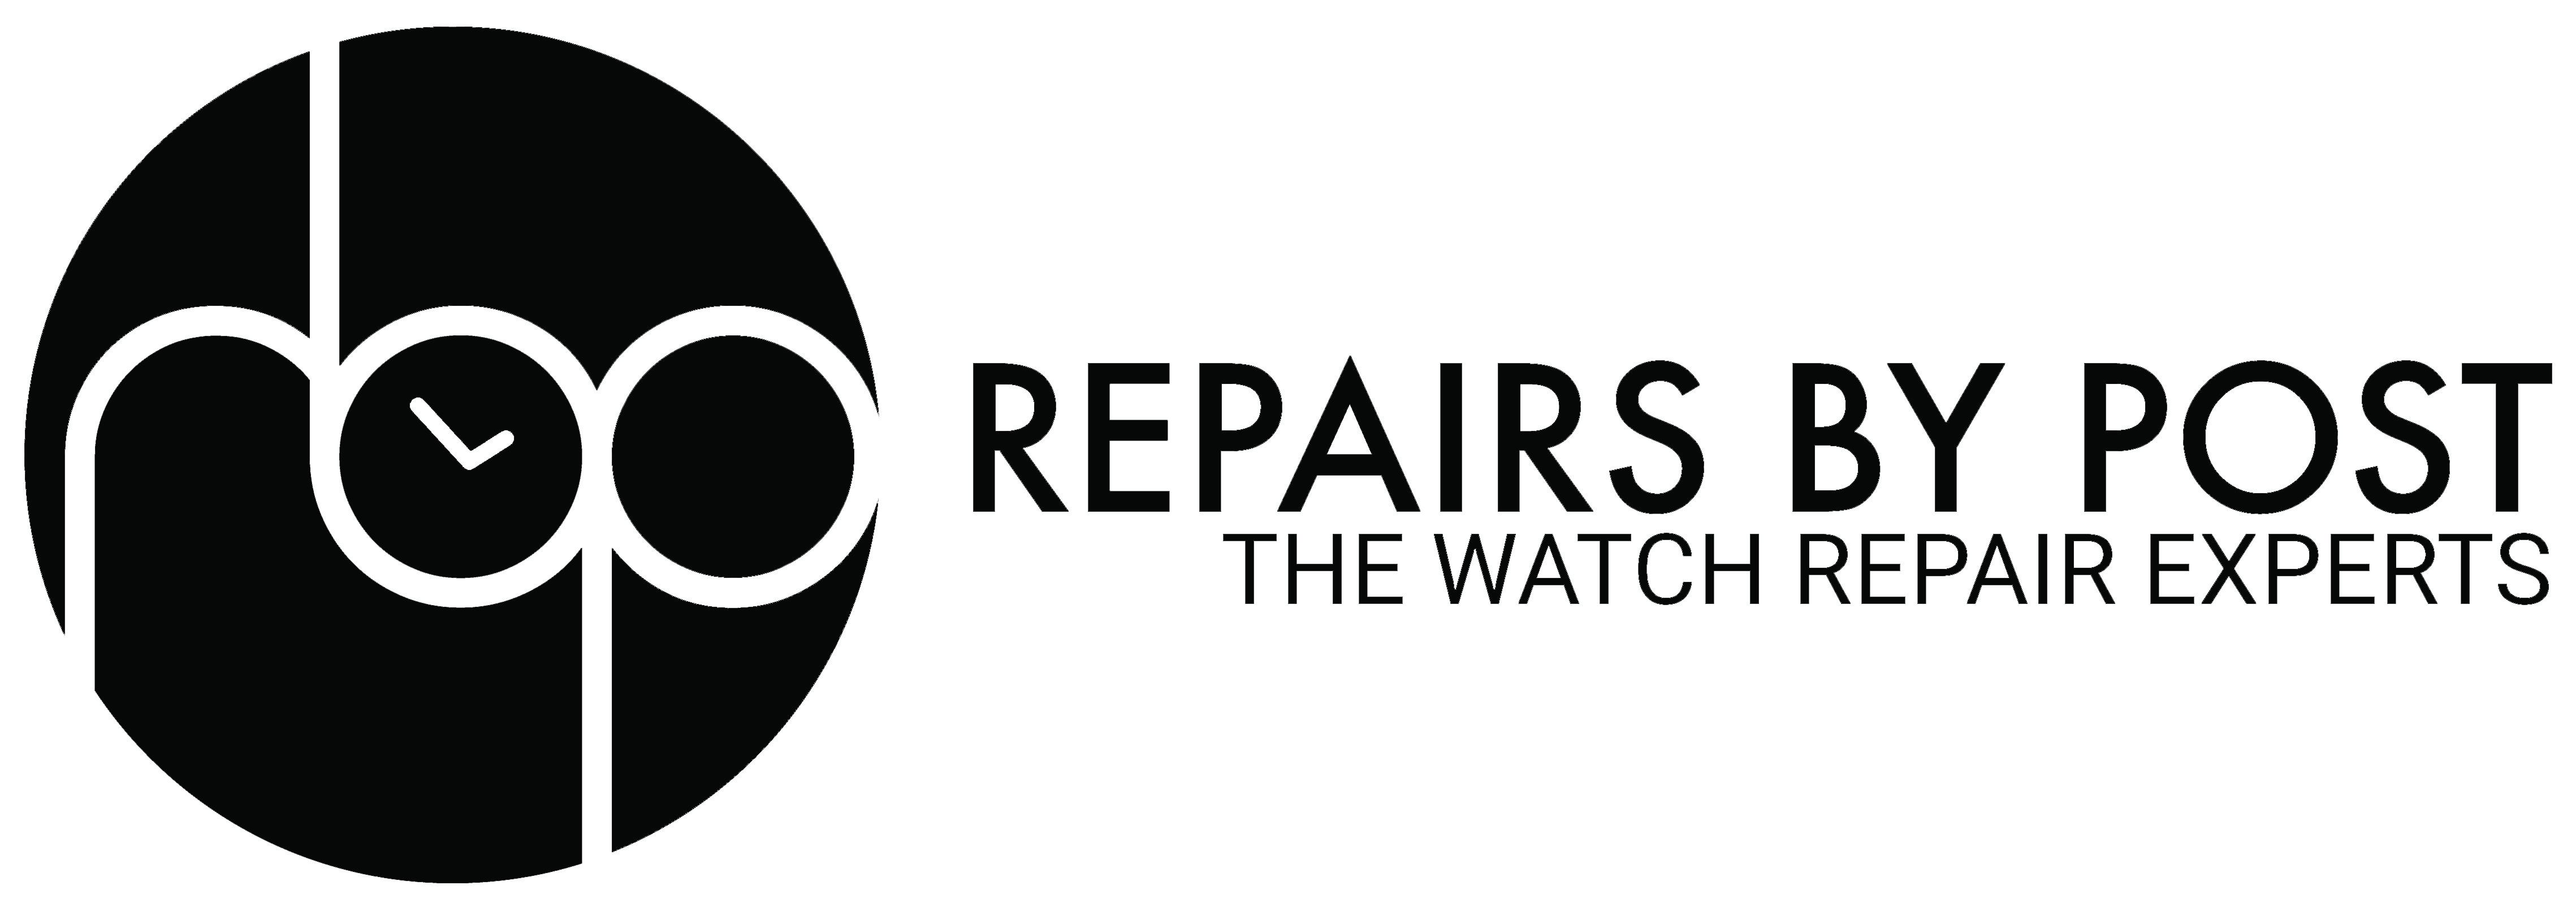 Repairs by Post